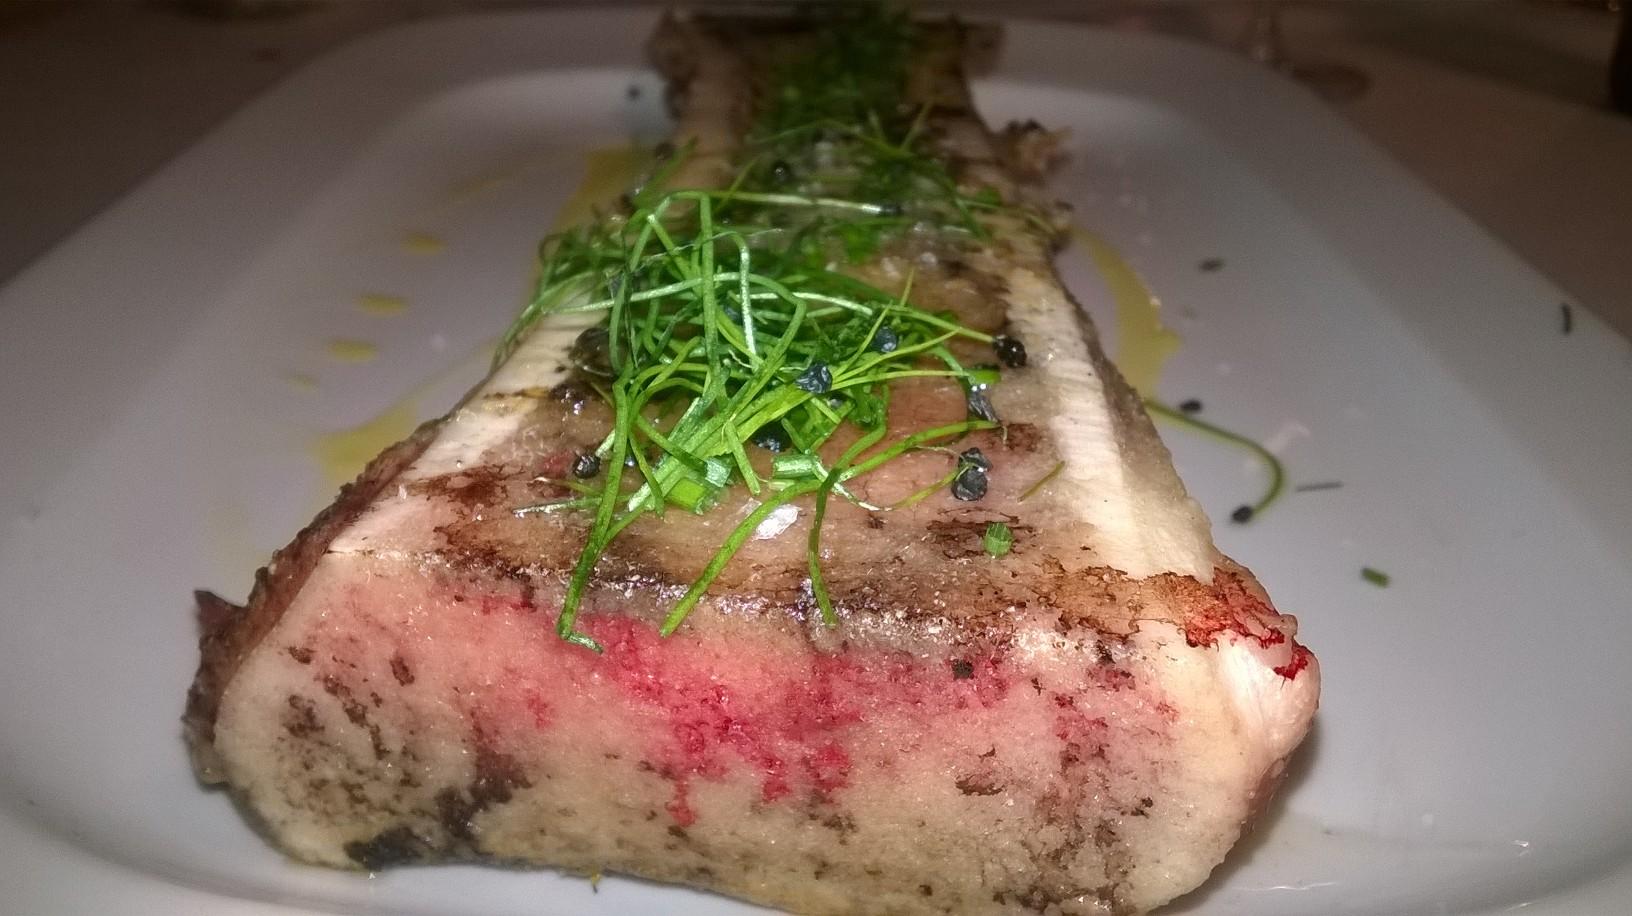 bloG-M_Aurelio_Gómez-MIranda_Restaurante_Tavella_Beniferri_Valencia_Tuétano